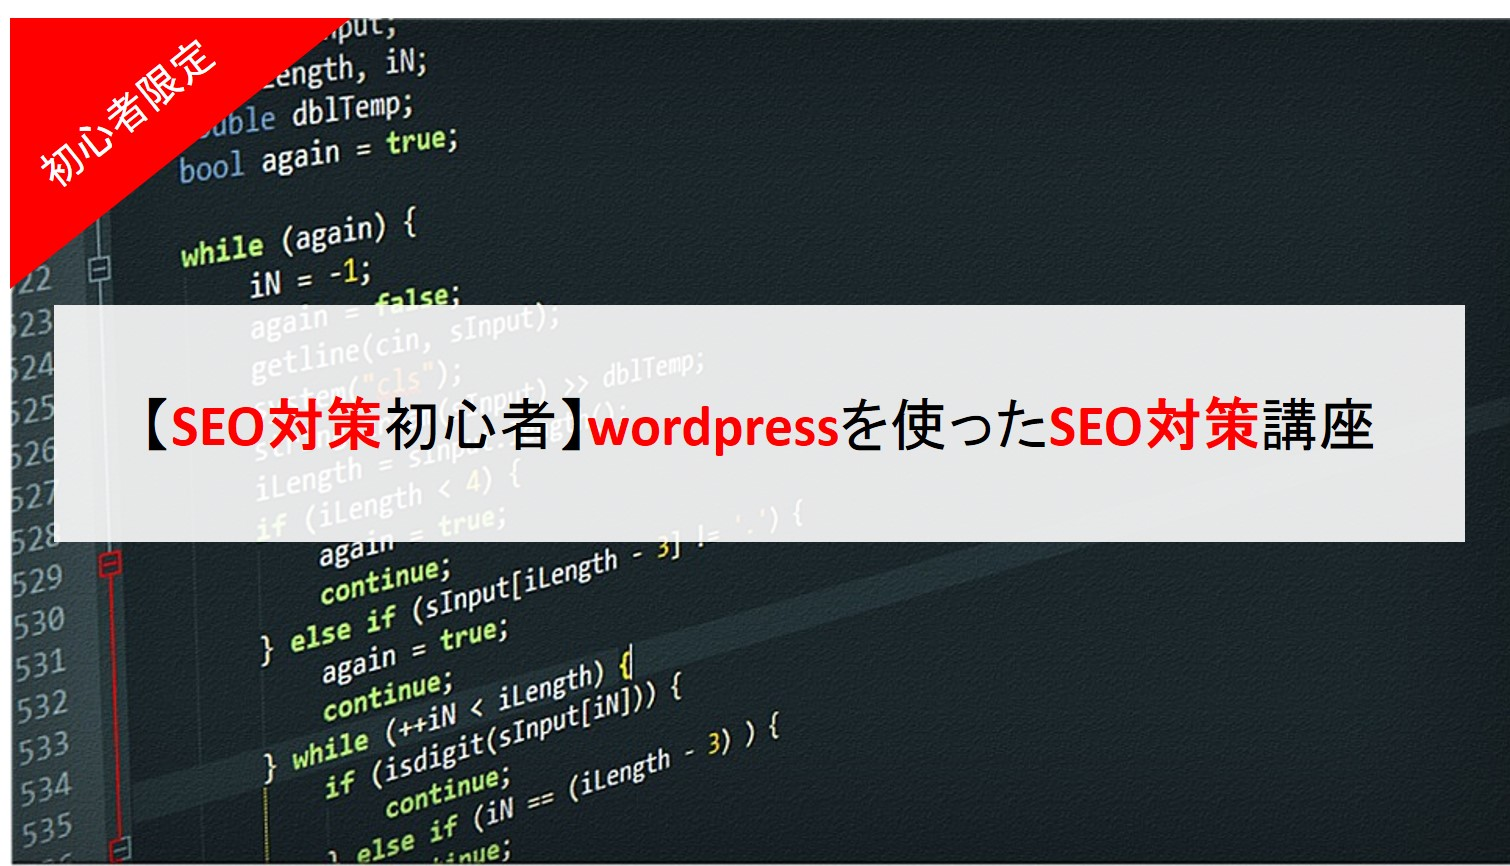 【SEO対策初心者】wordpressを使ったSEO対策講座